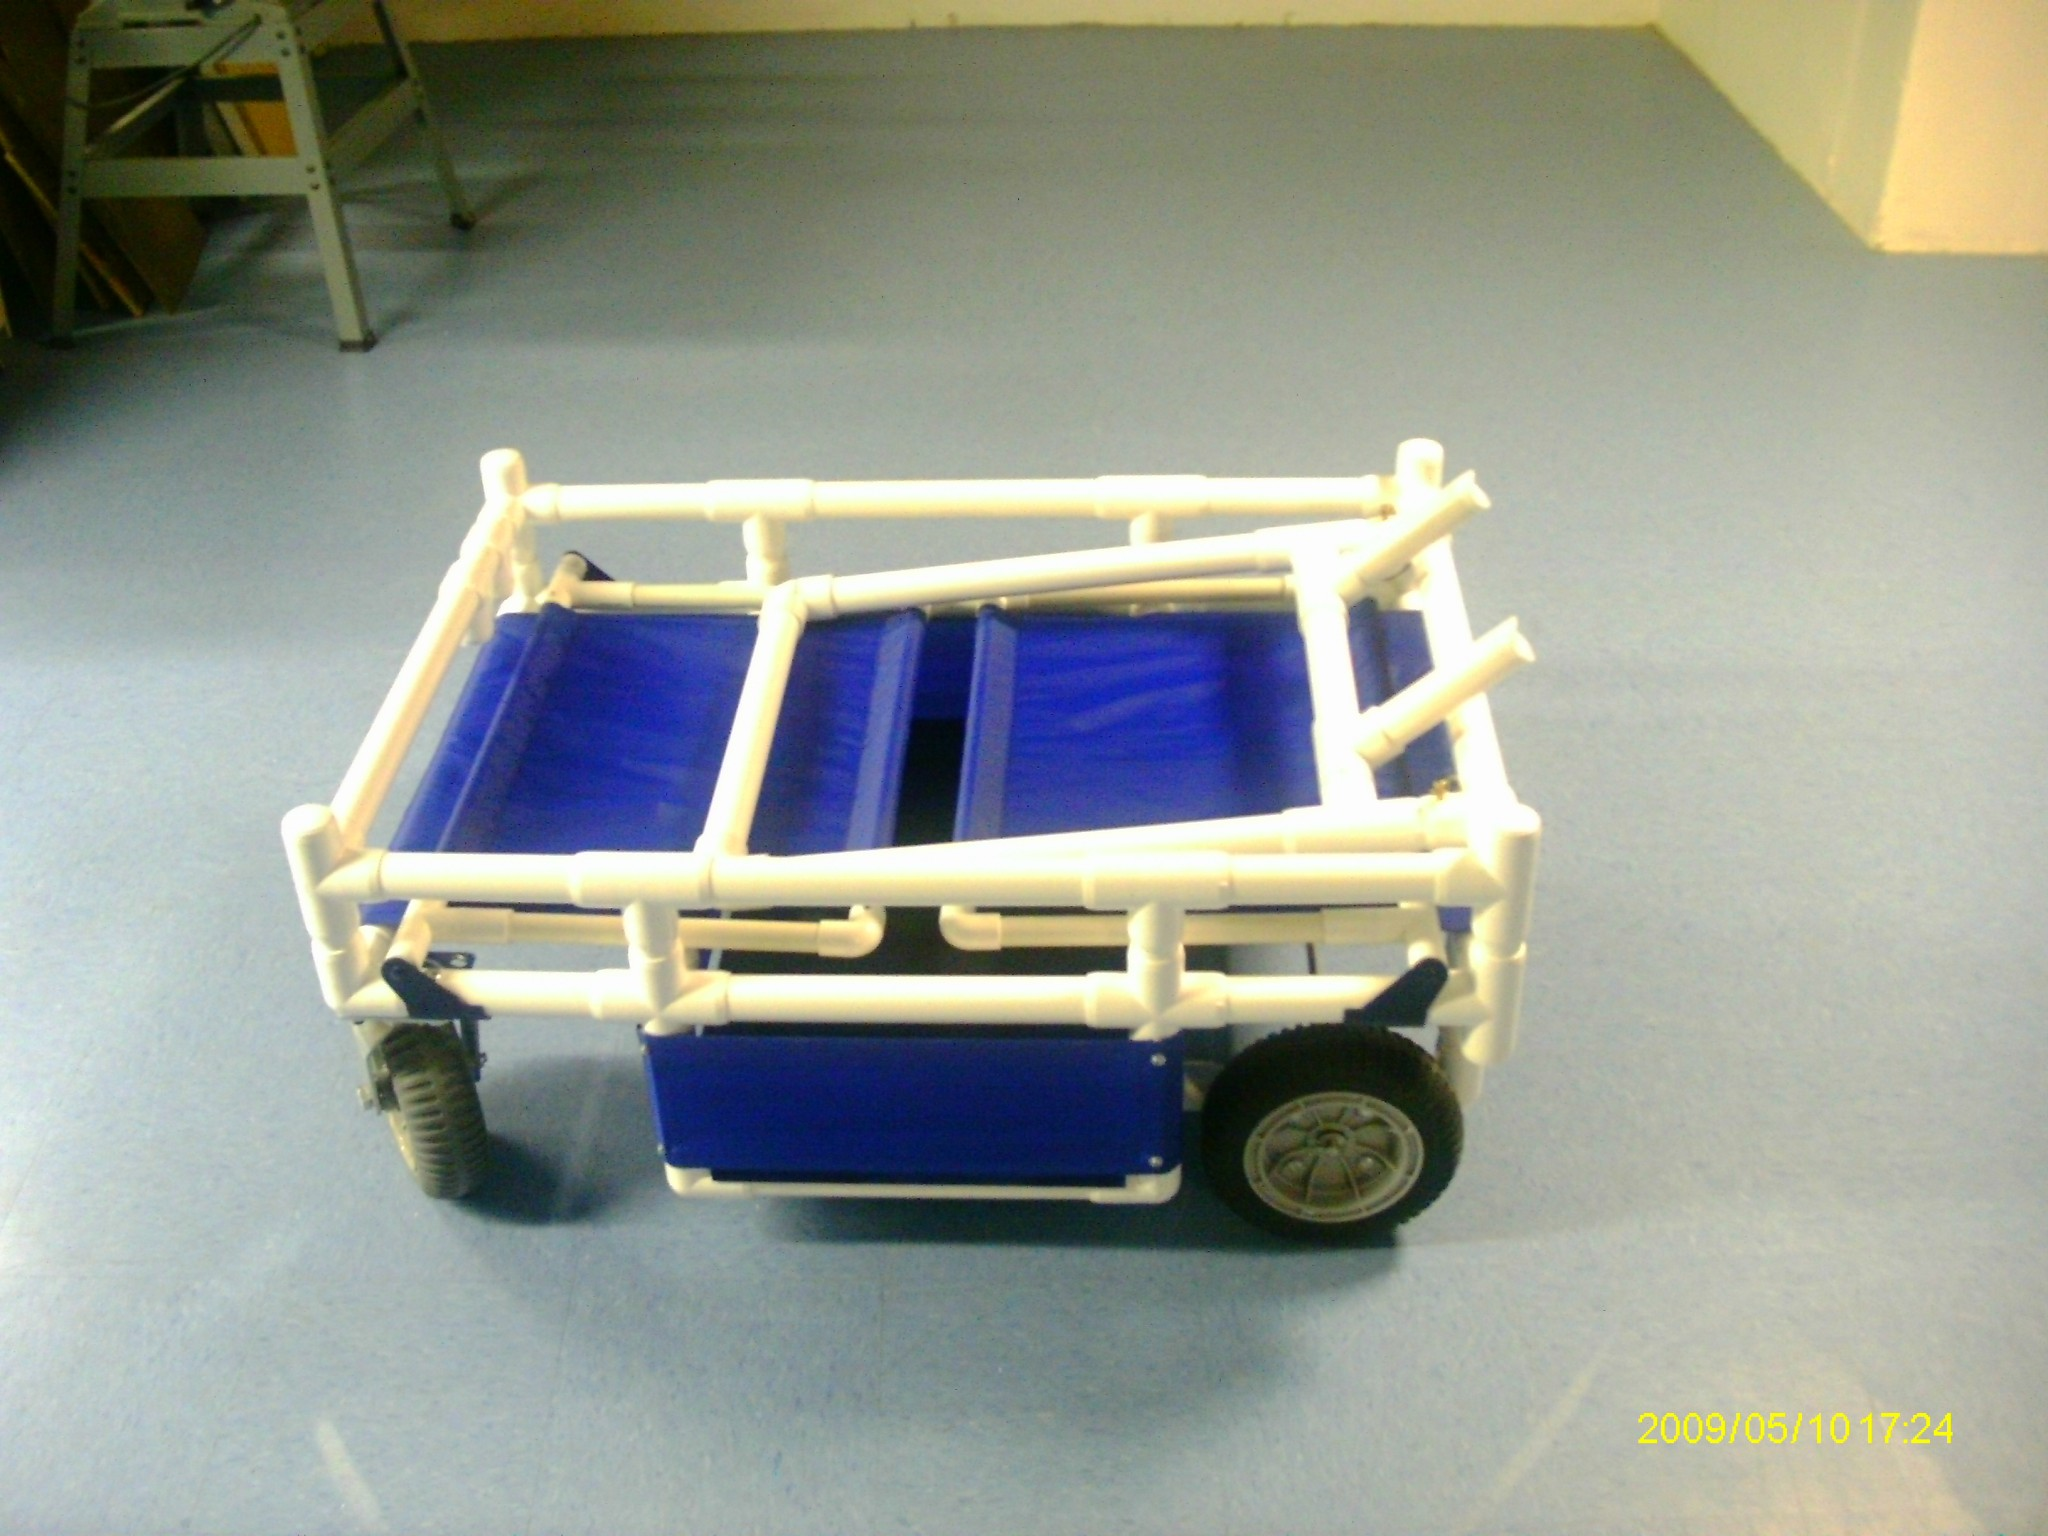 Folded up modular stroller